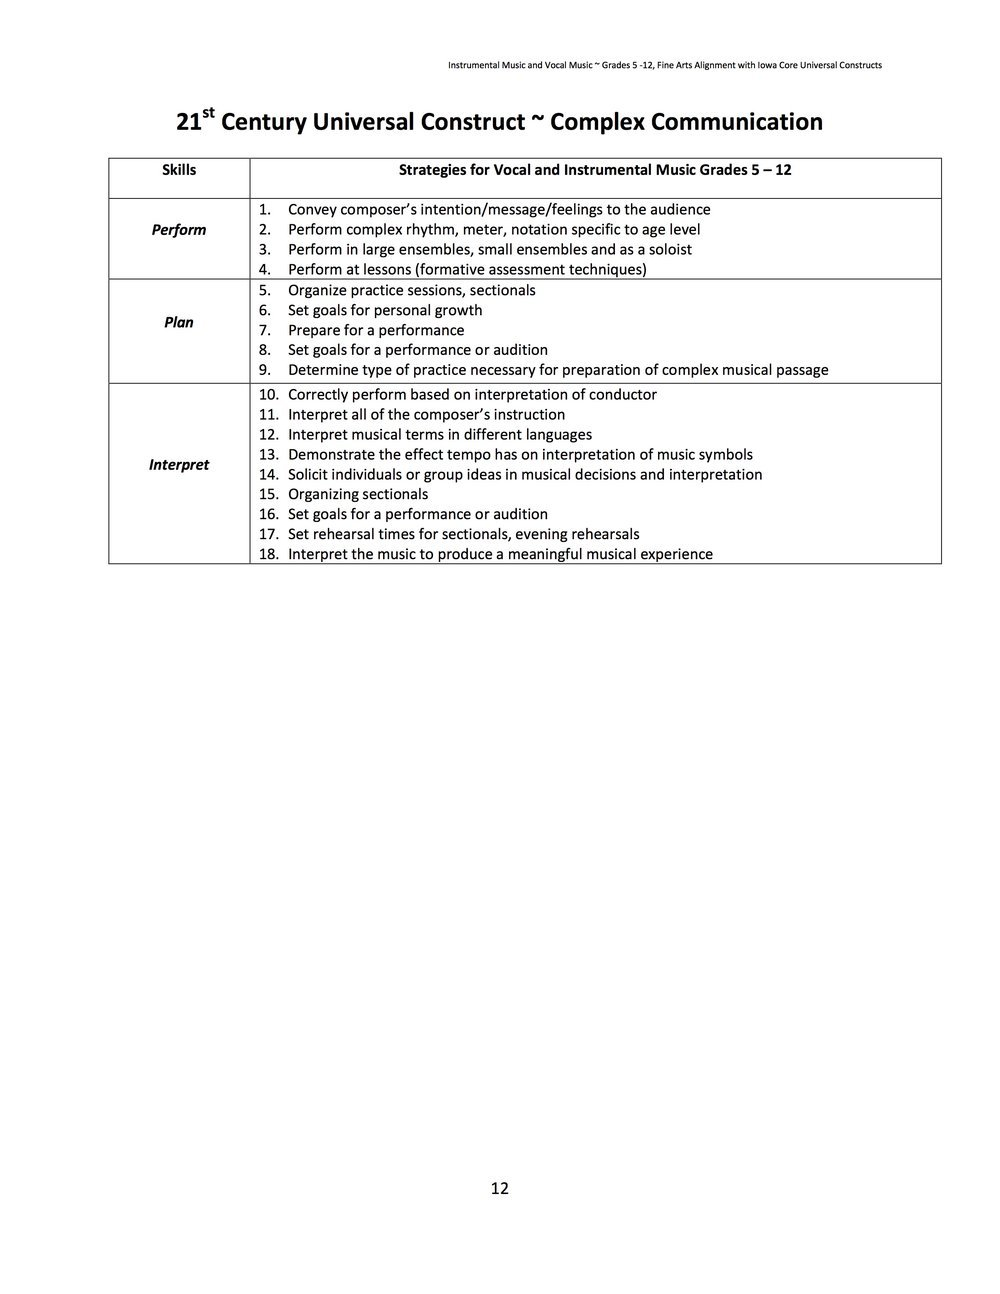 dc137-complexcommunication.jpg